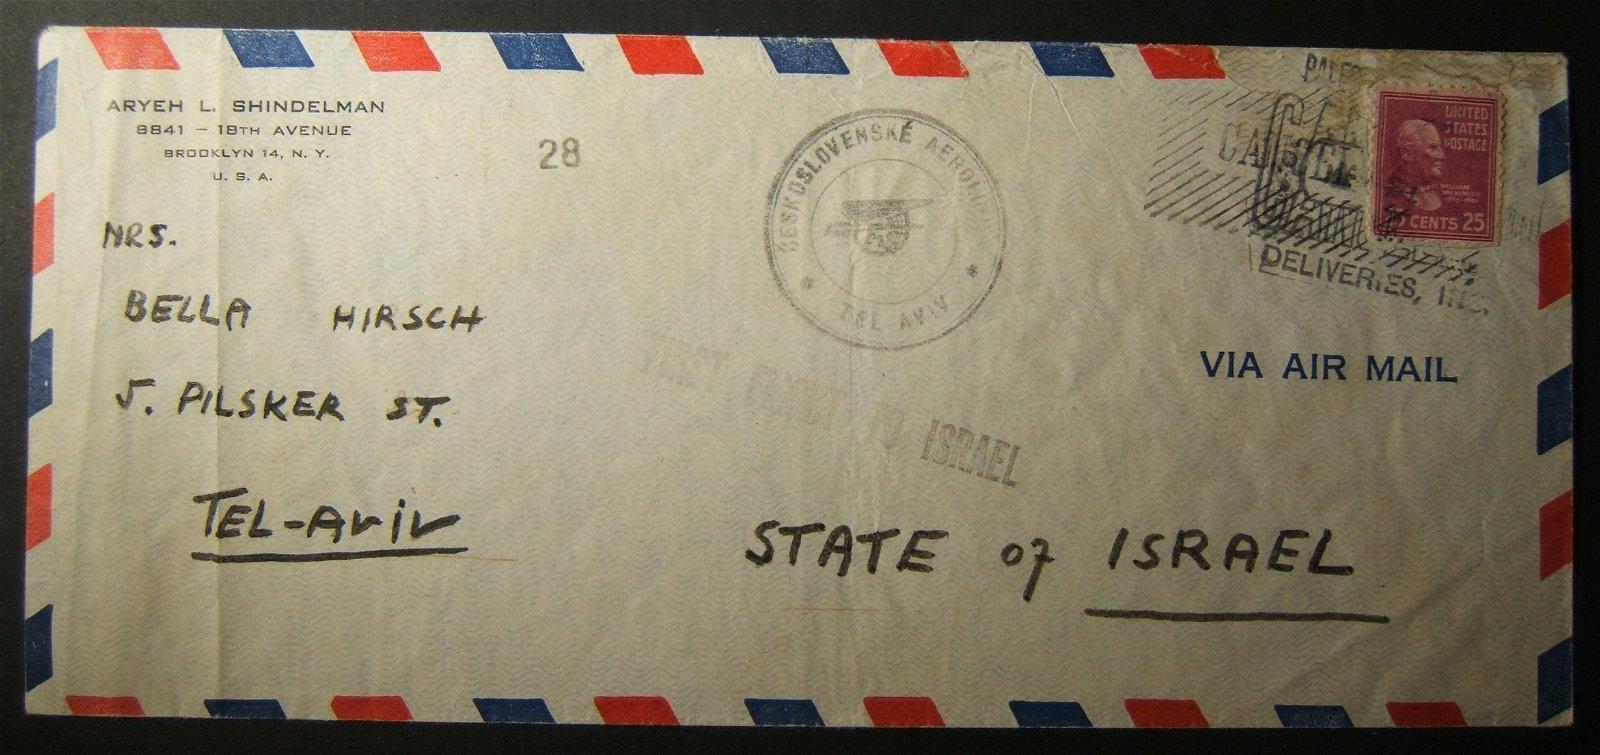 21-5-1948 1st PEDI airmail to TEL AVIV: #28 w/ both